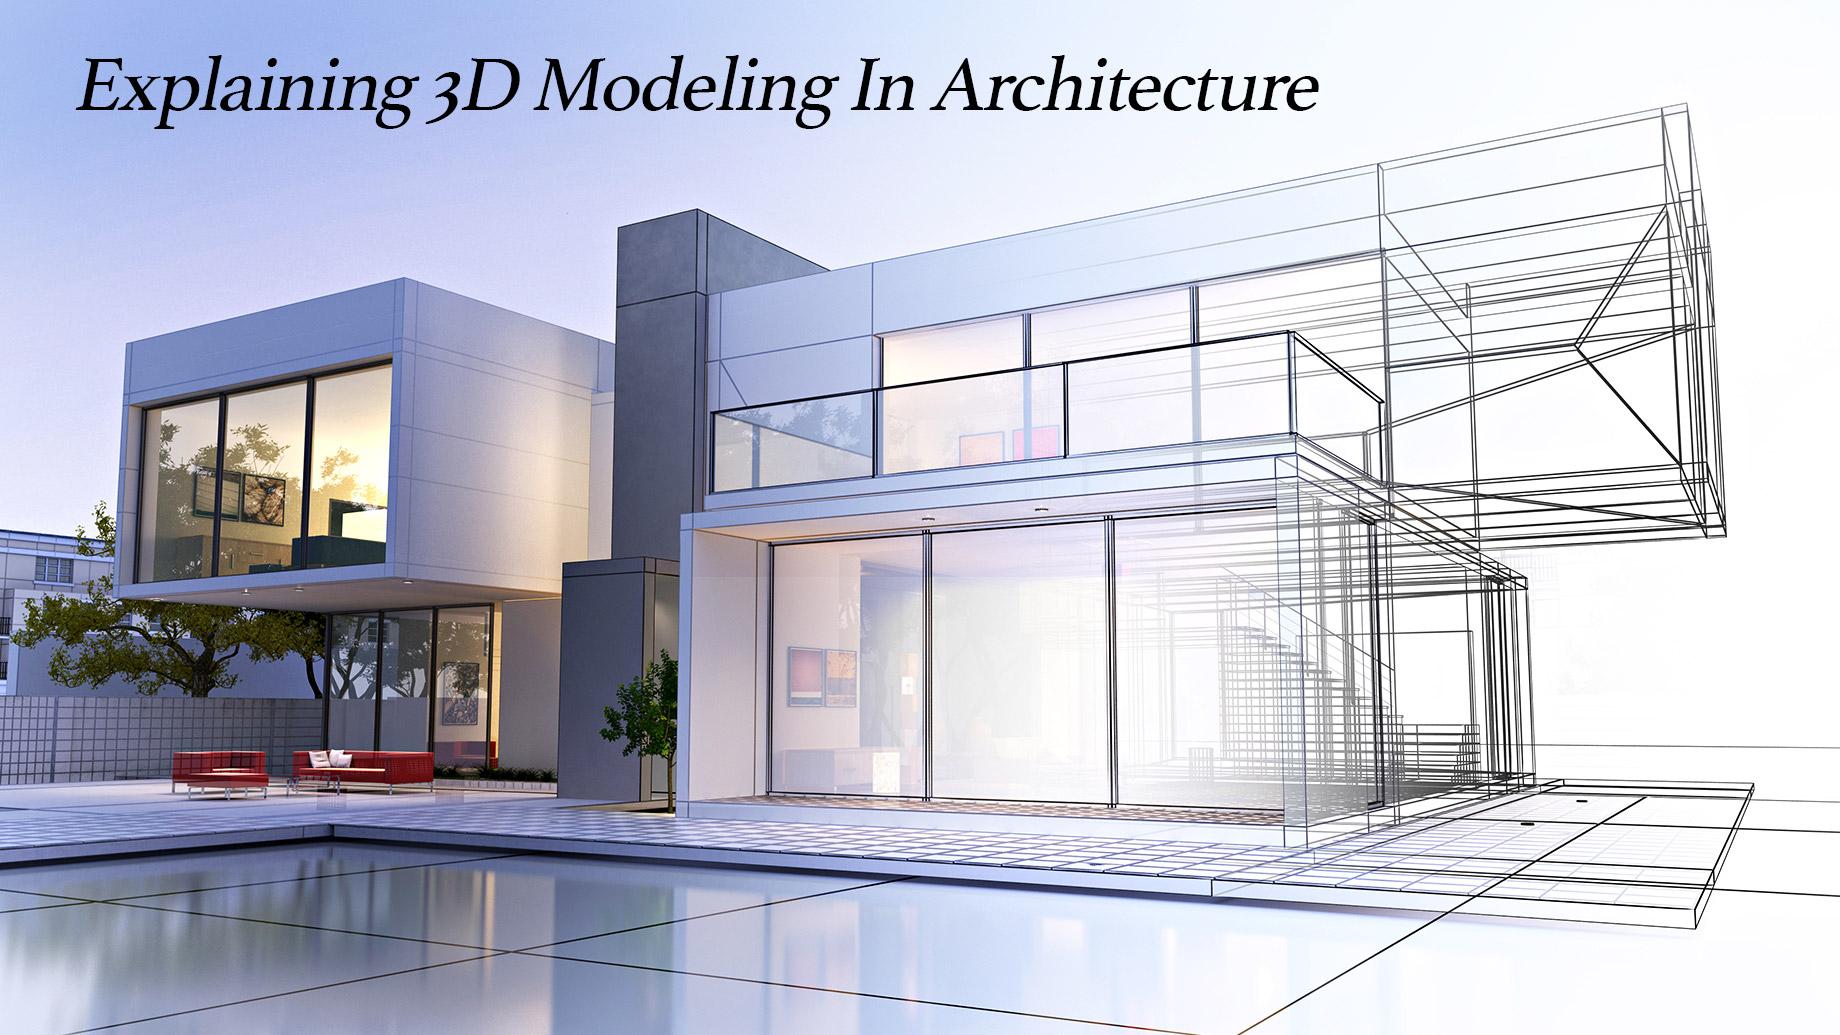 Explaining 3D Modeling In Architecture